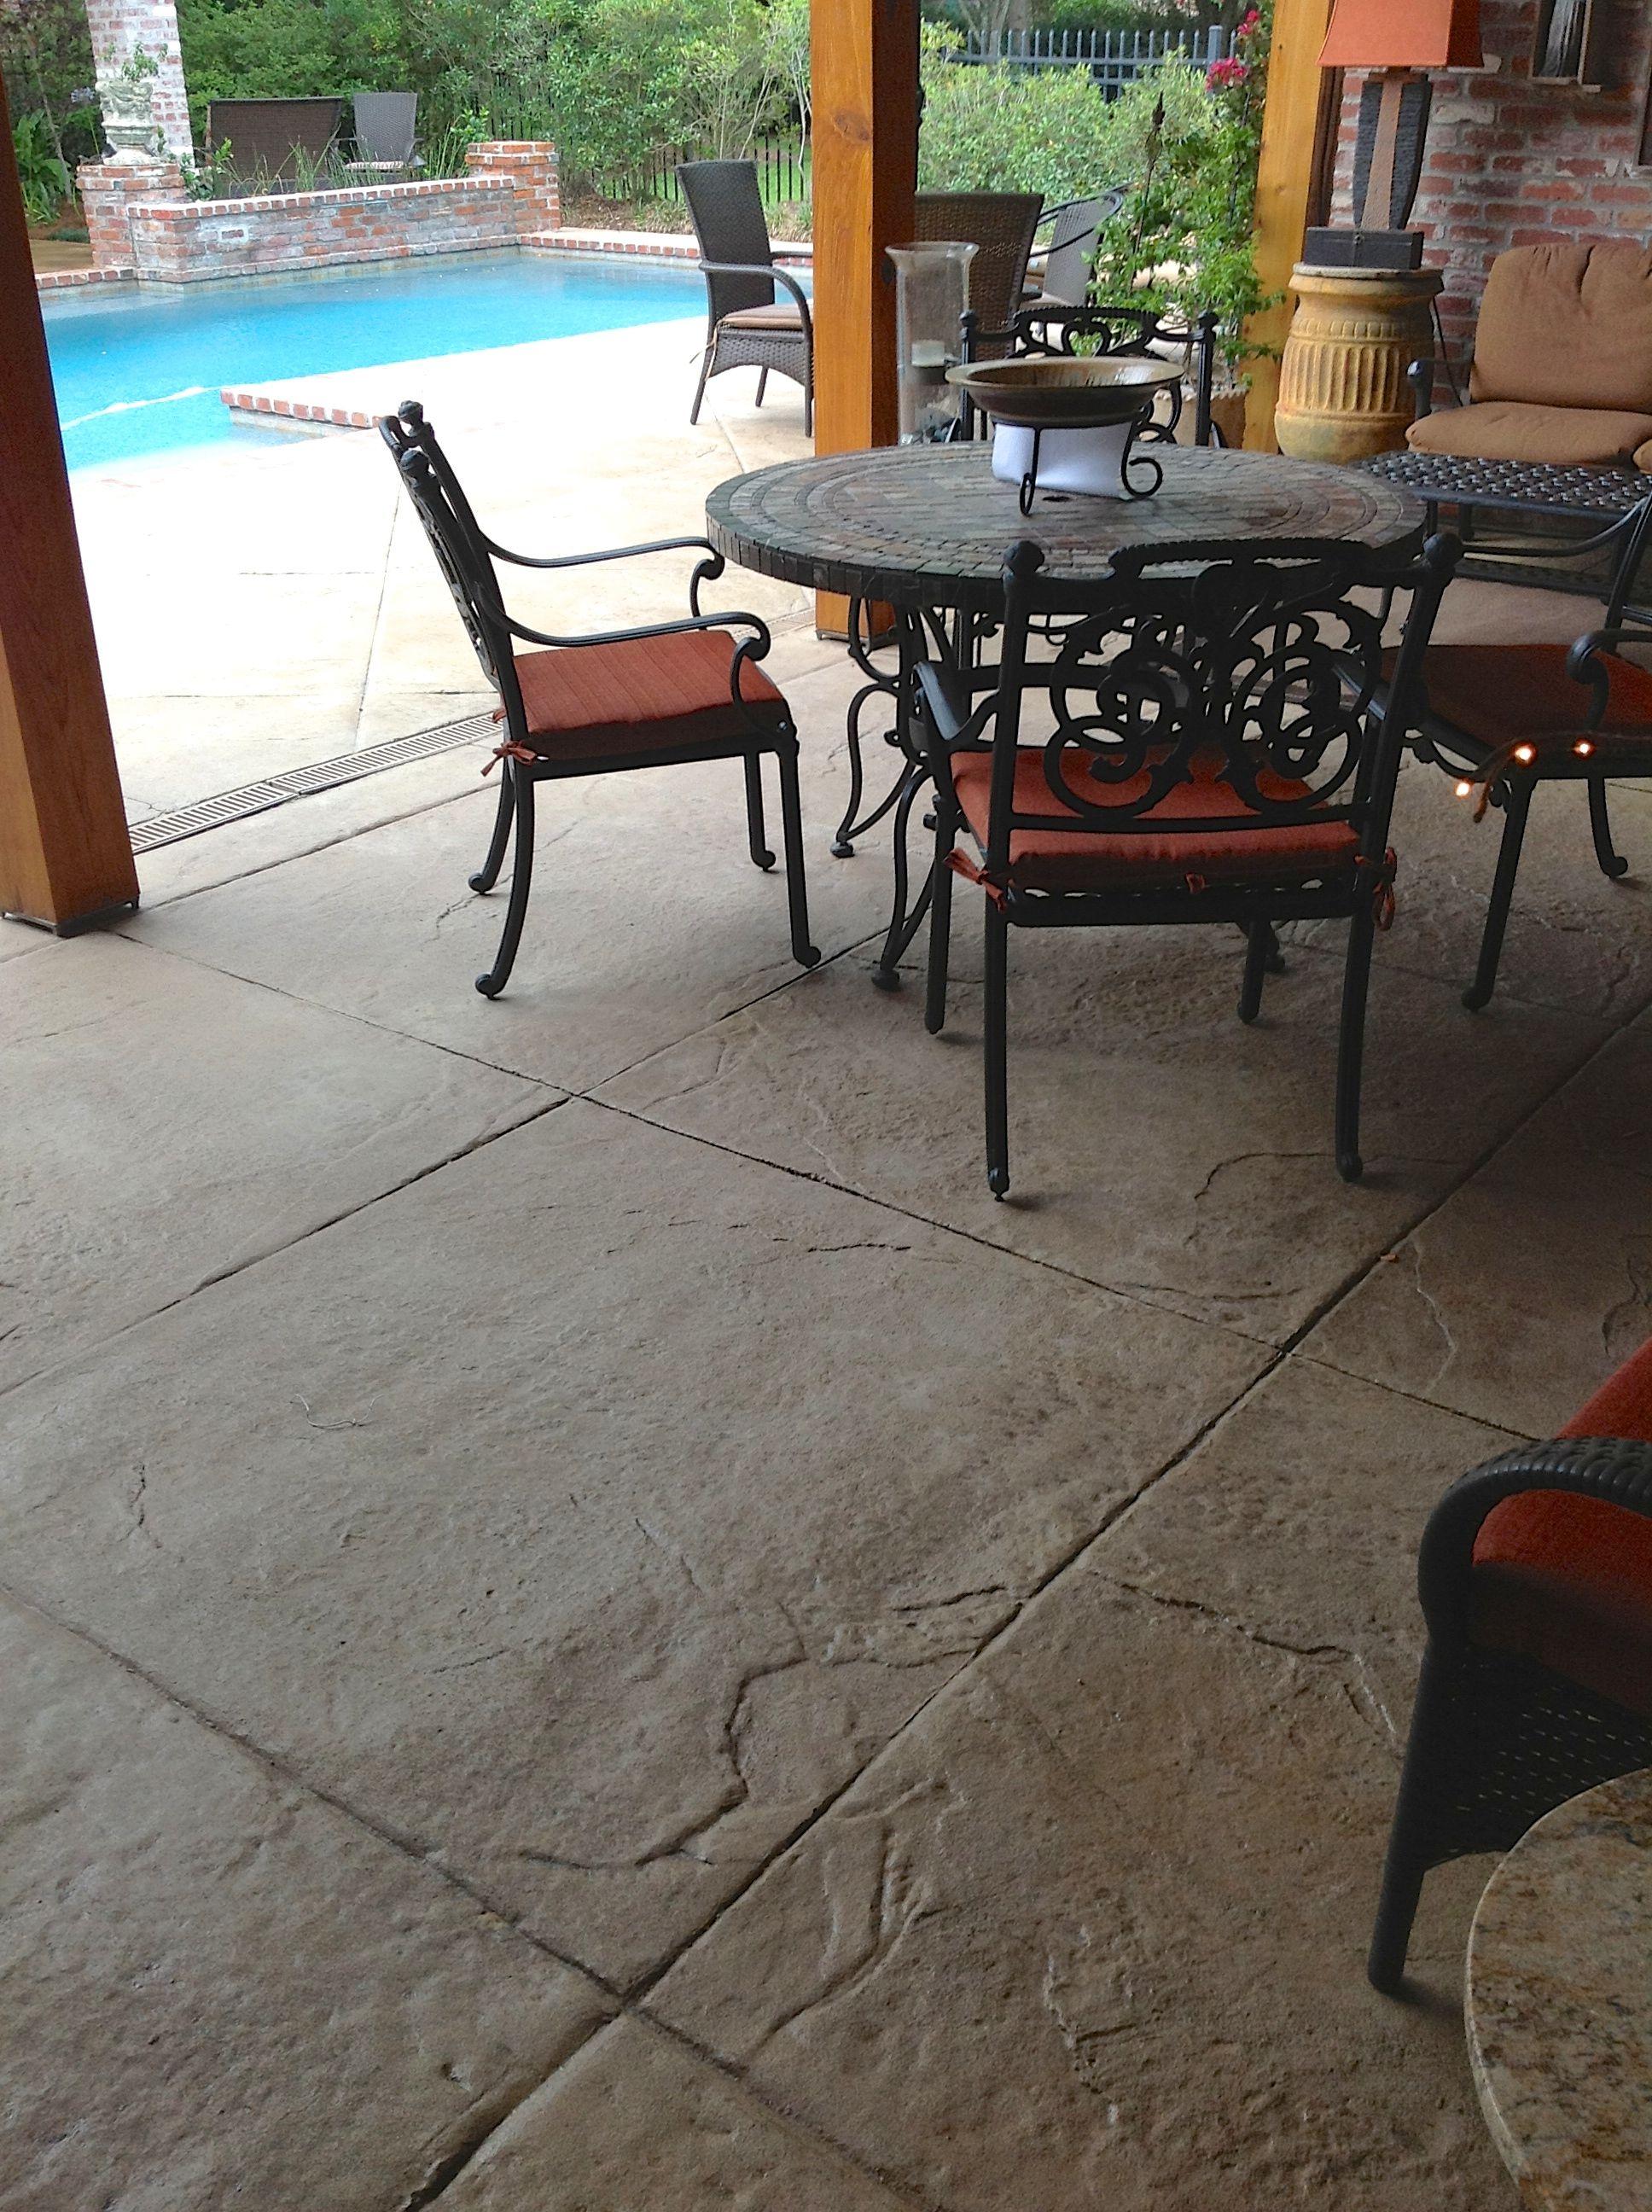 Stamped Textured Concrete Patio Area With Diamond Scoring regarding sizing 1936 X 2592